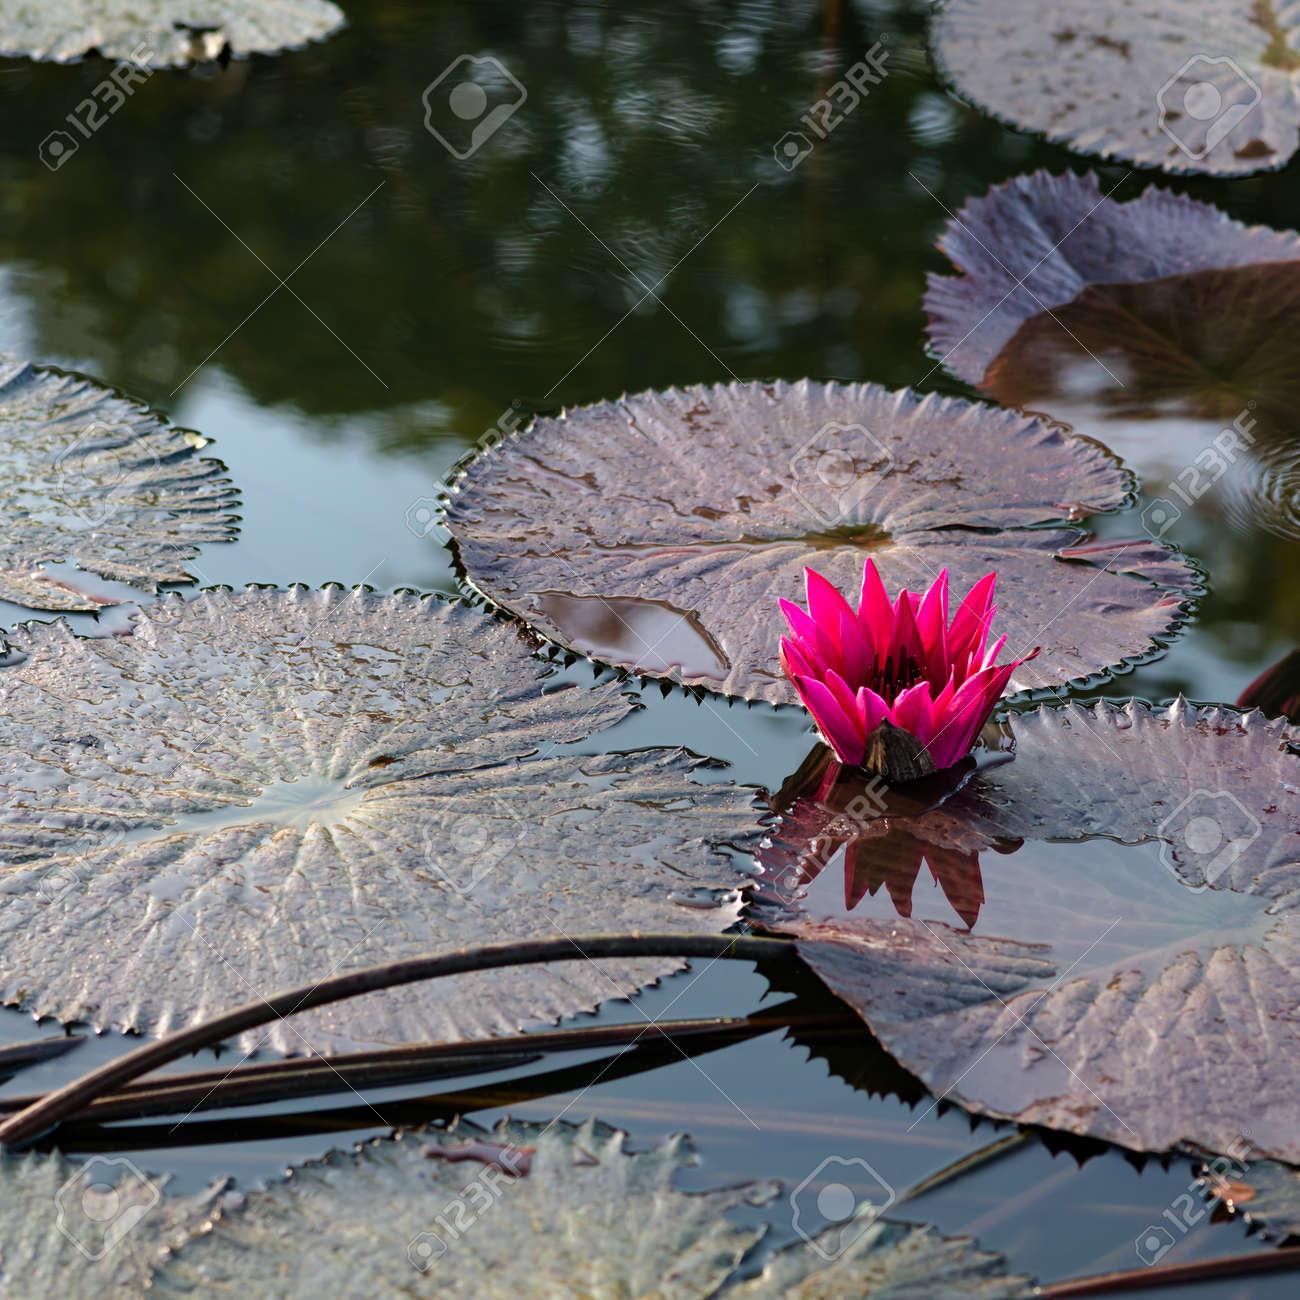 Single water lily lotus flower pond square composition stock photo single water lily lotus flower pond square composition stock photo 47560830 izmirmasajfo